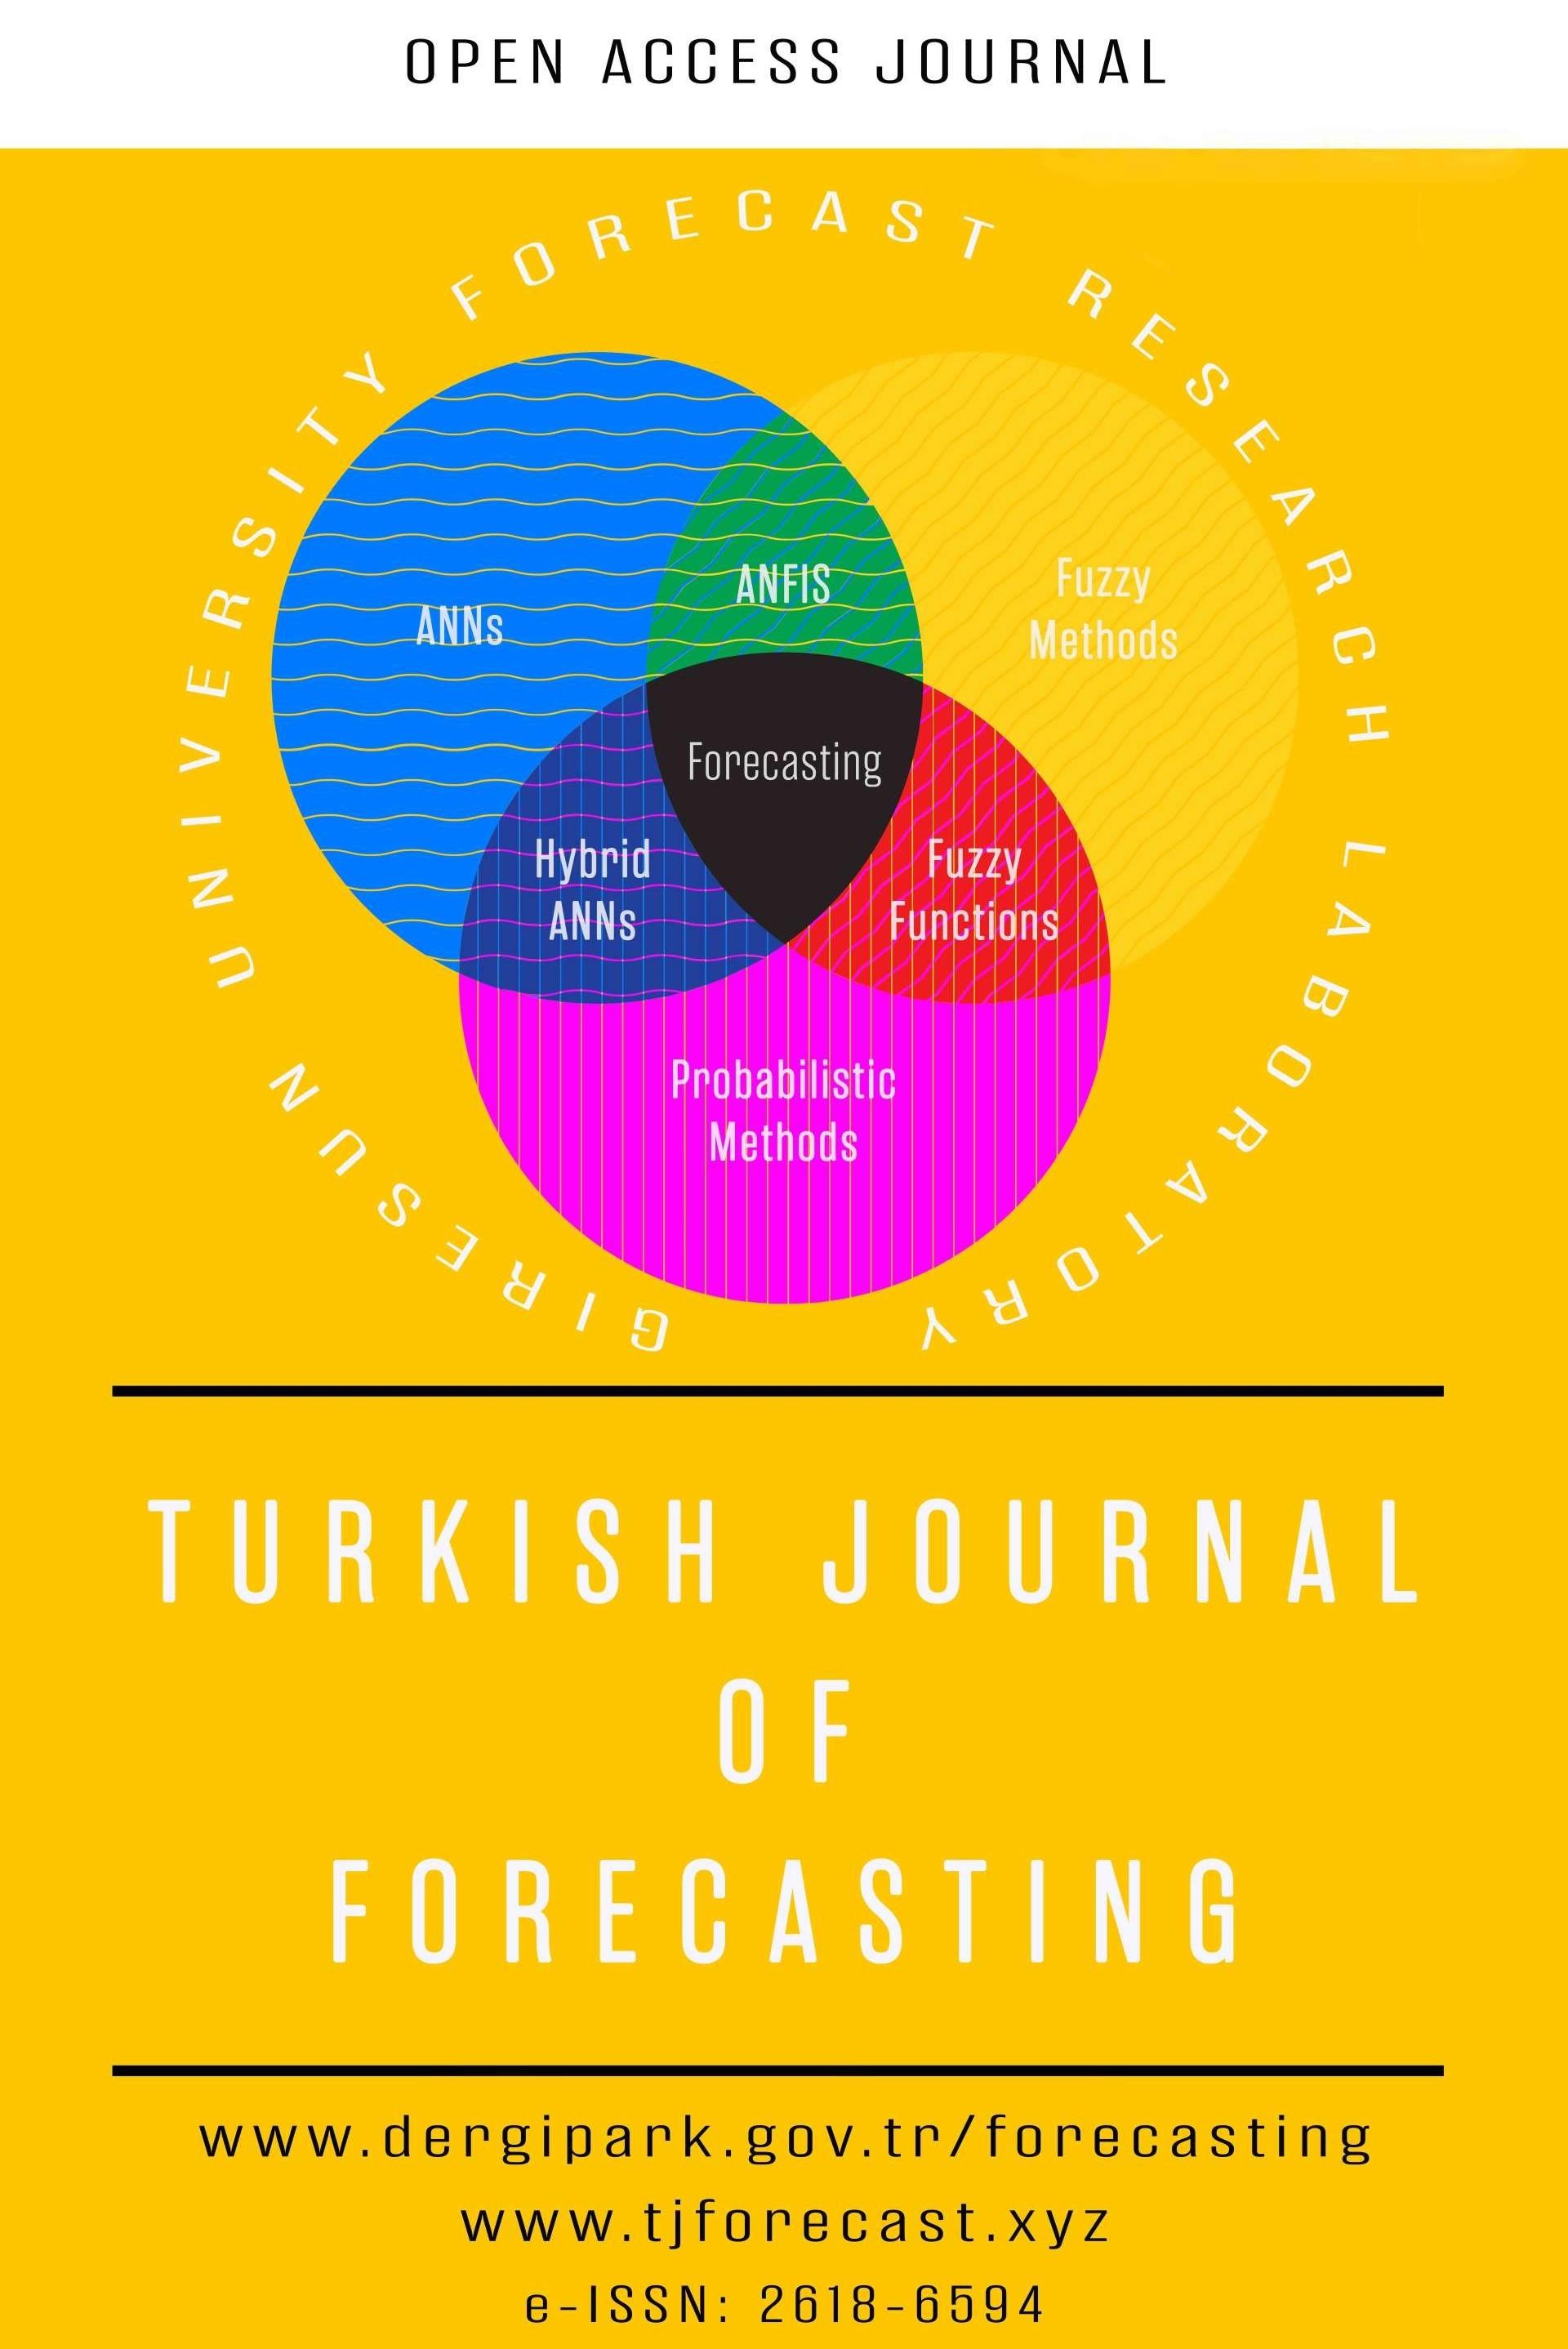 Turkish Journal of Forecasting